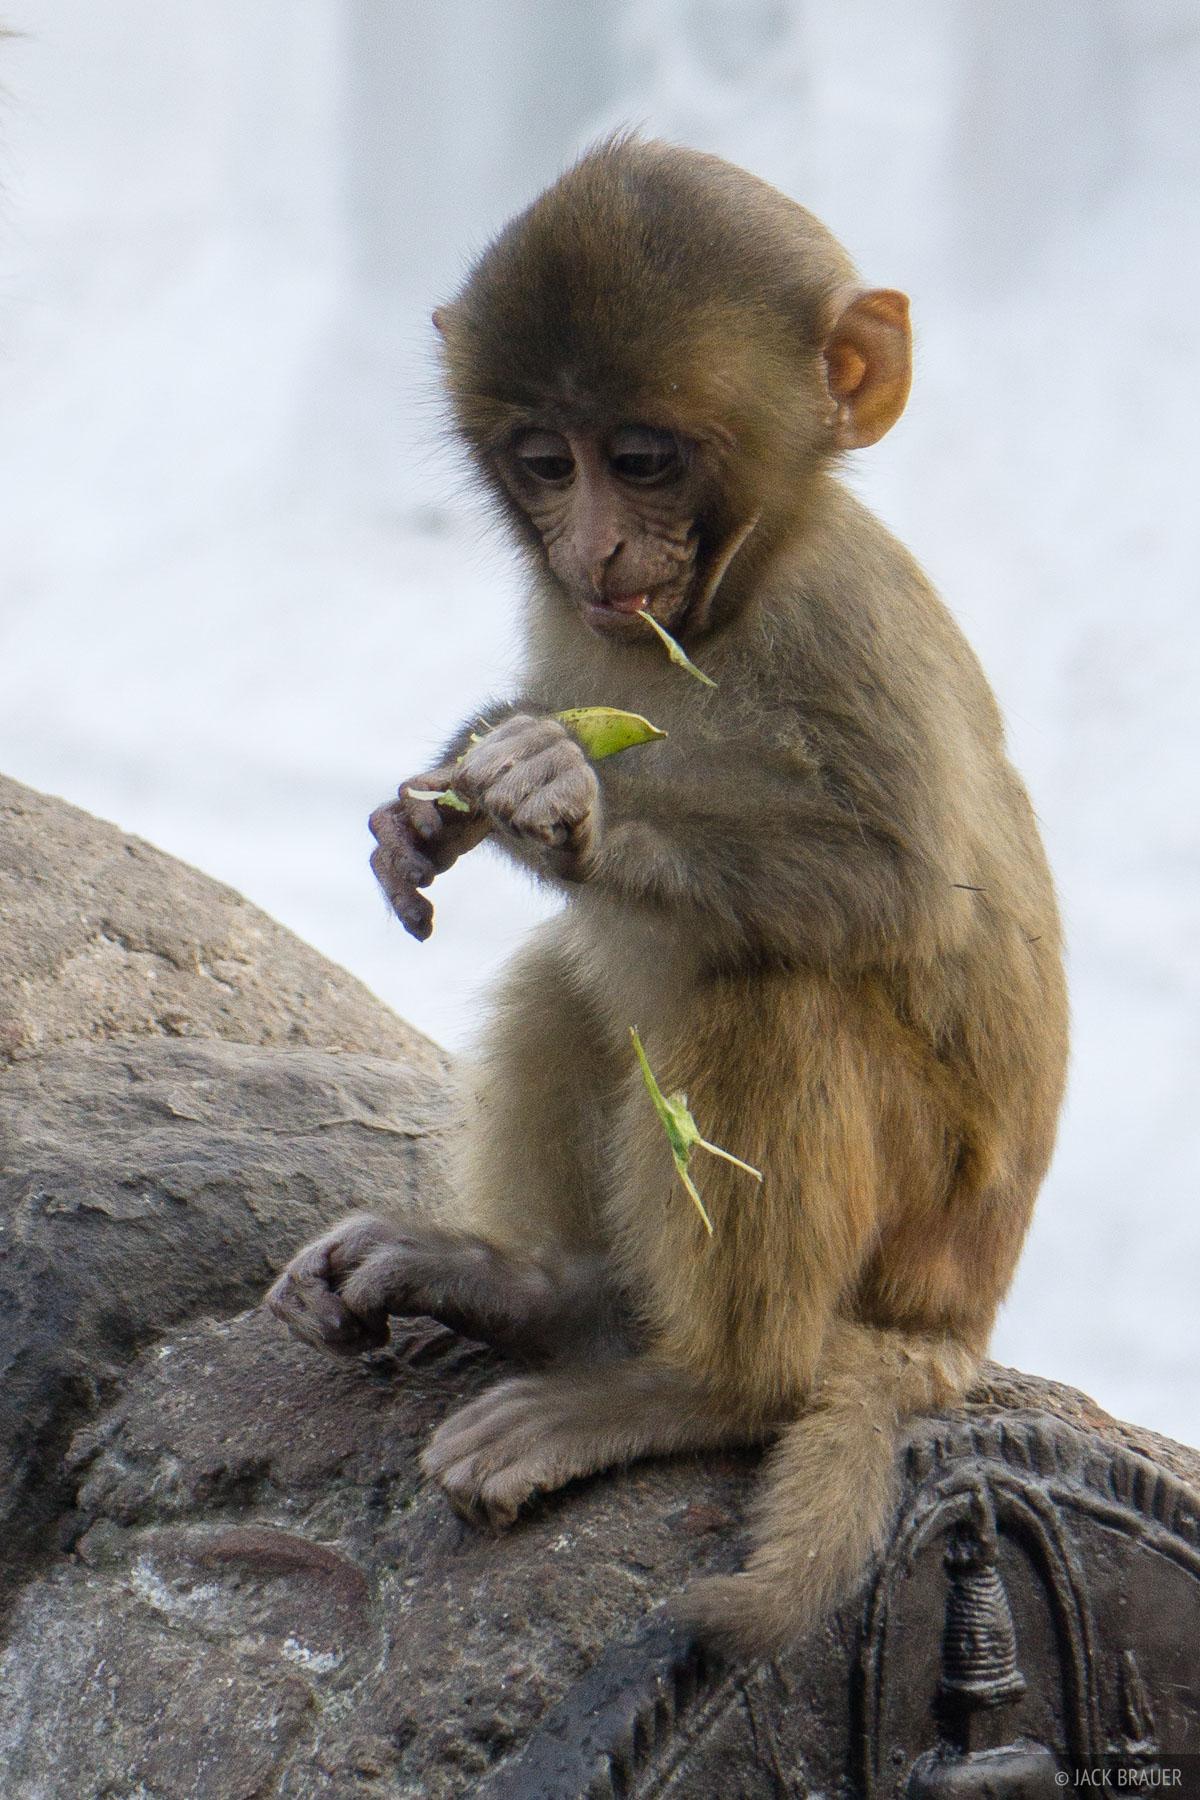 Asia, Kathmandu, Nepal, Swayambhunath, monkey, November, wildlife, monkies, 2014